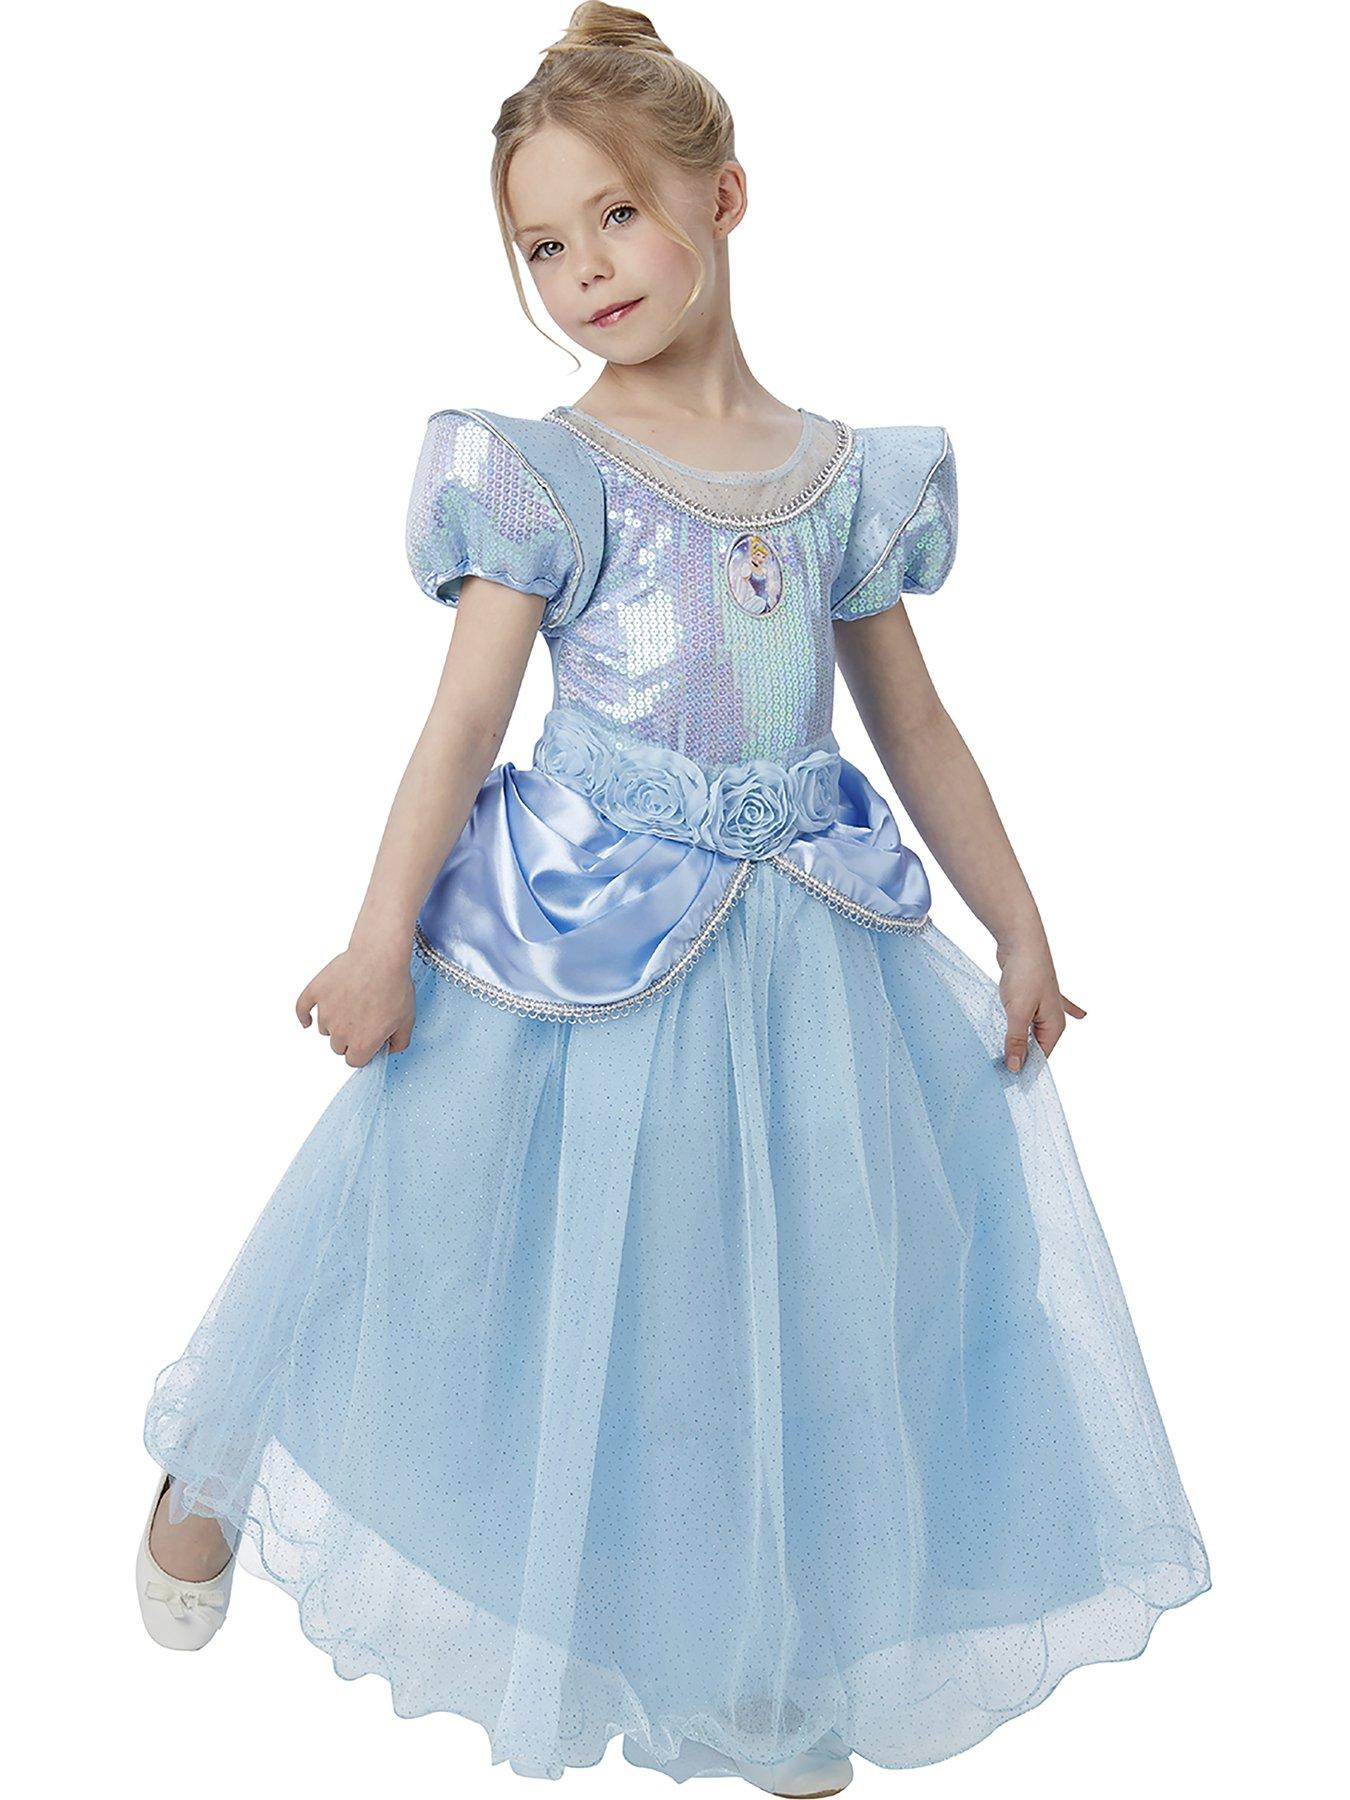 Cinderella Costume Kids Princess Halloween Fancy Dress